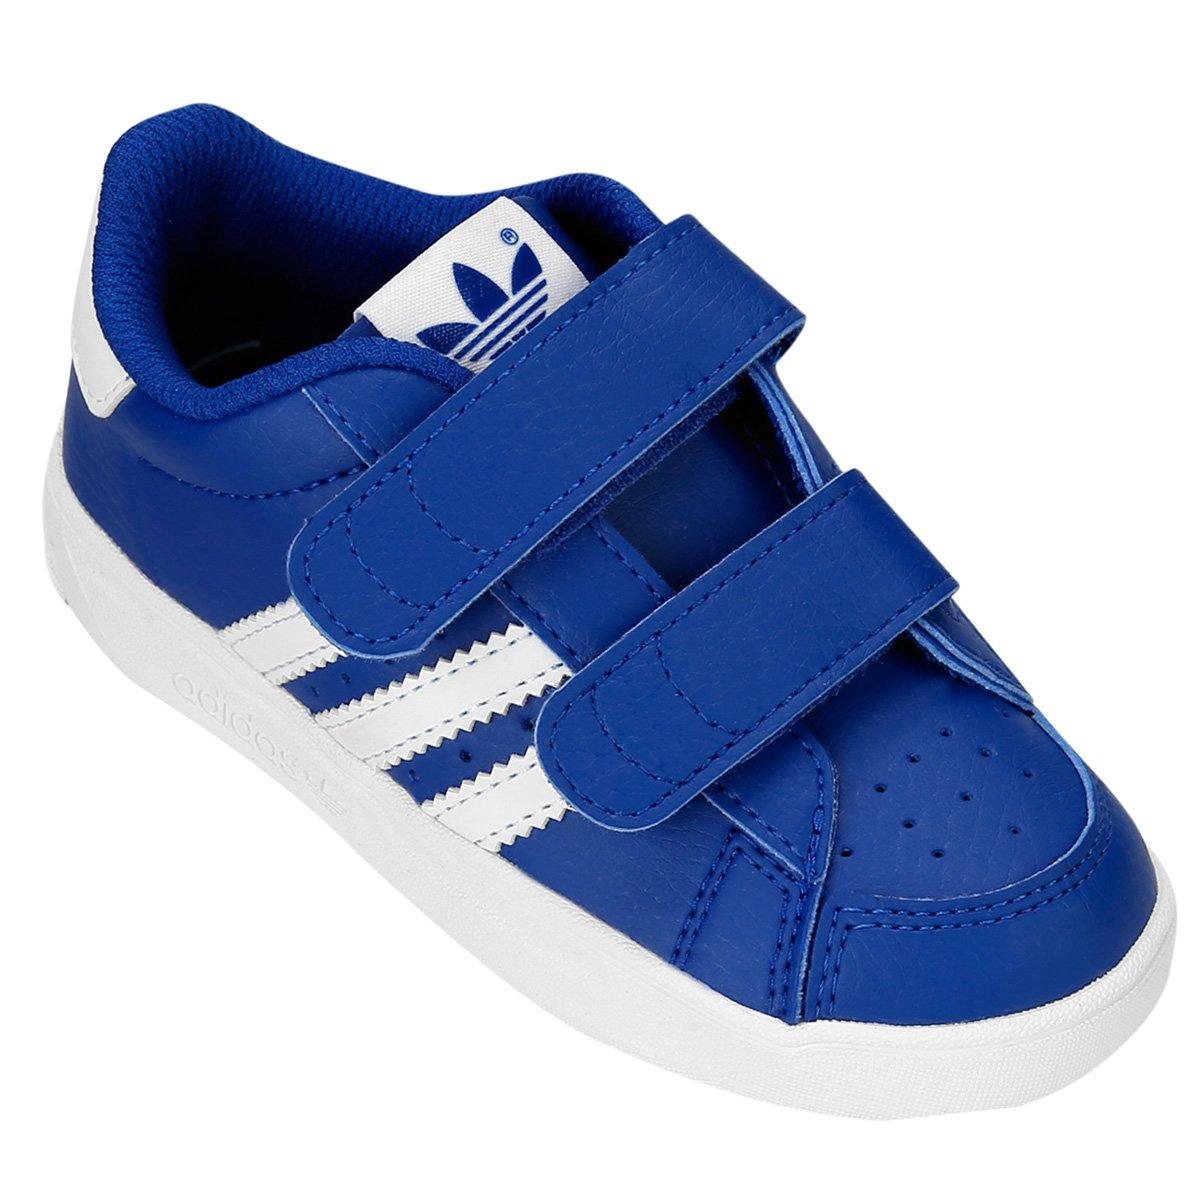 competitive price 58007 423ee Tênis Adidas Alumno CF Infantil ...